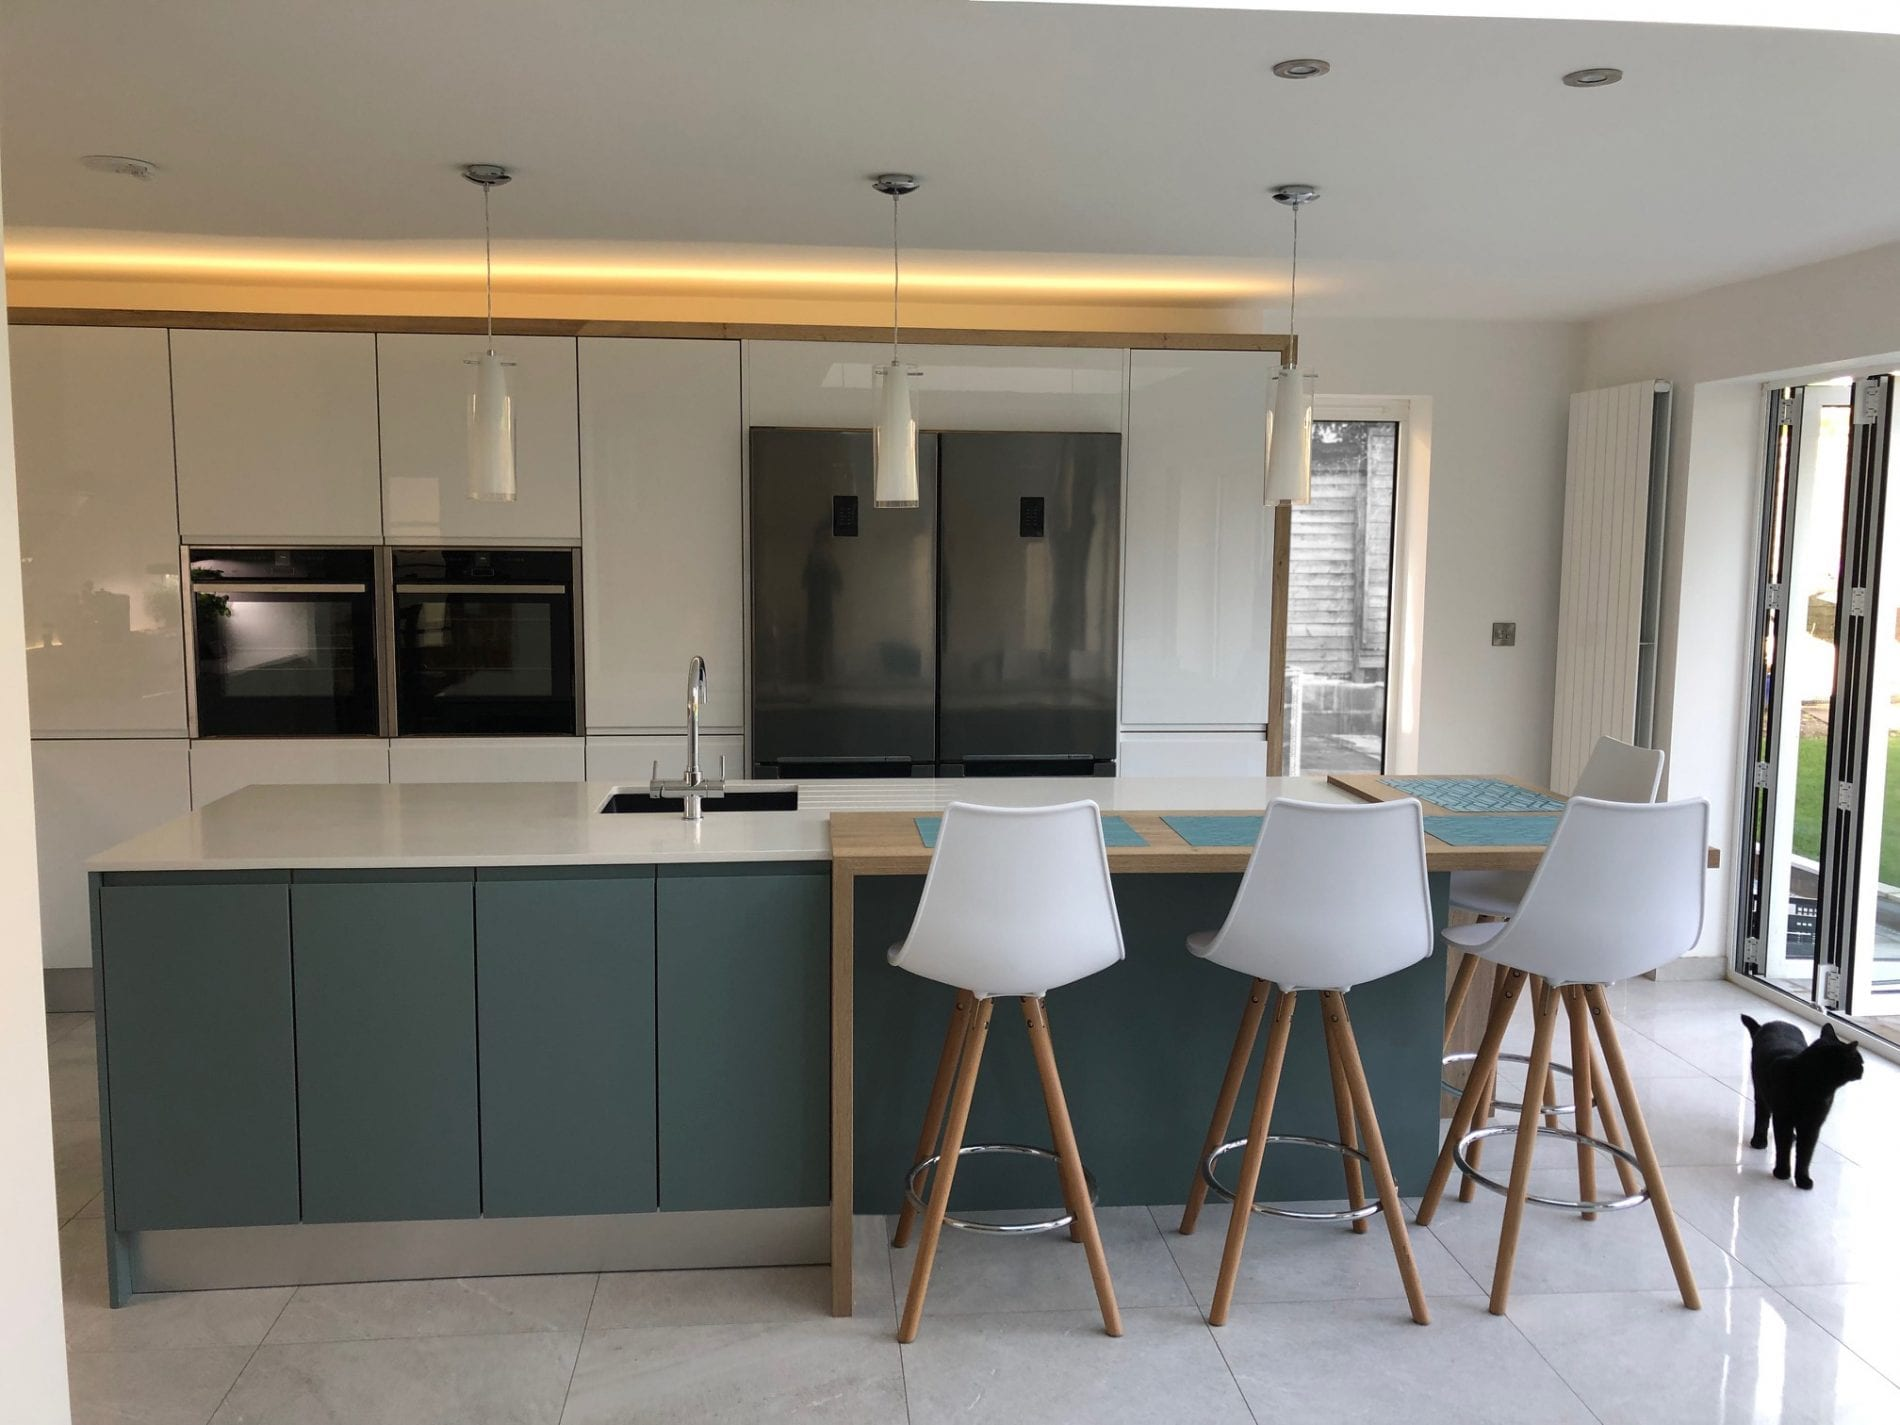 Gloss Matt Wood Kitchen Finishes: Gloss White & Matt Teal Handleless